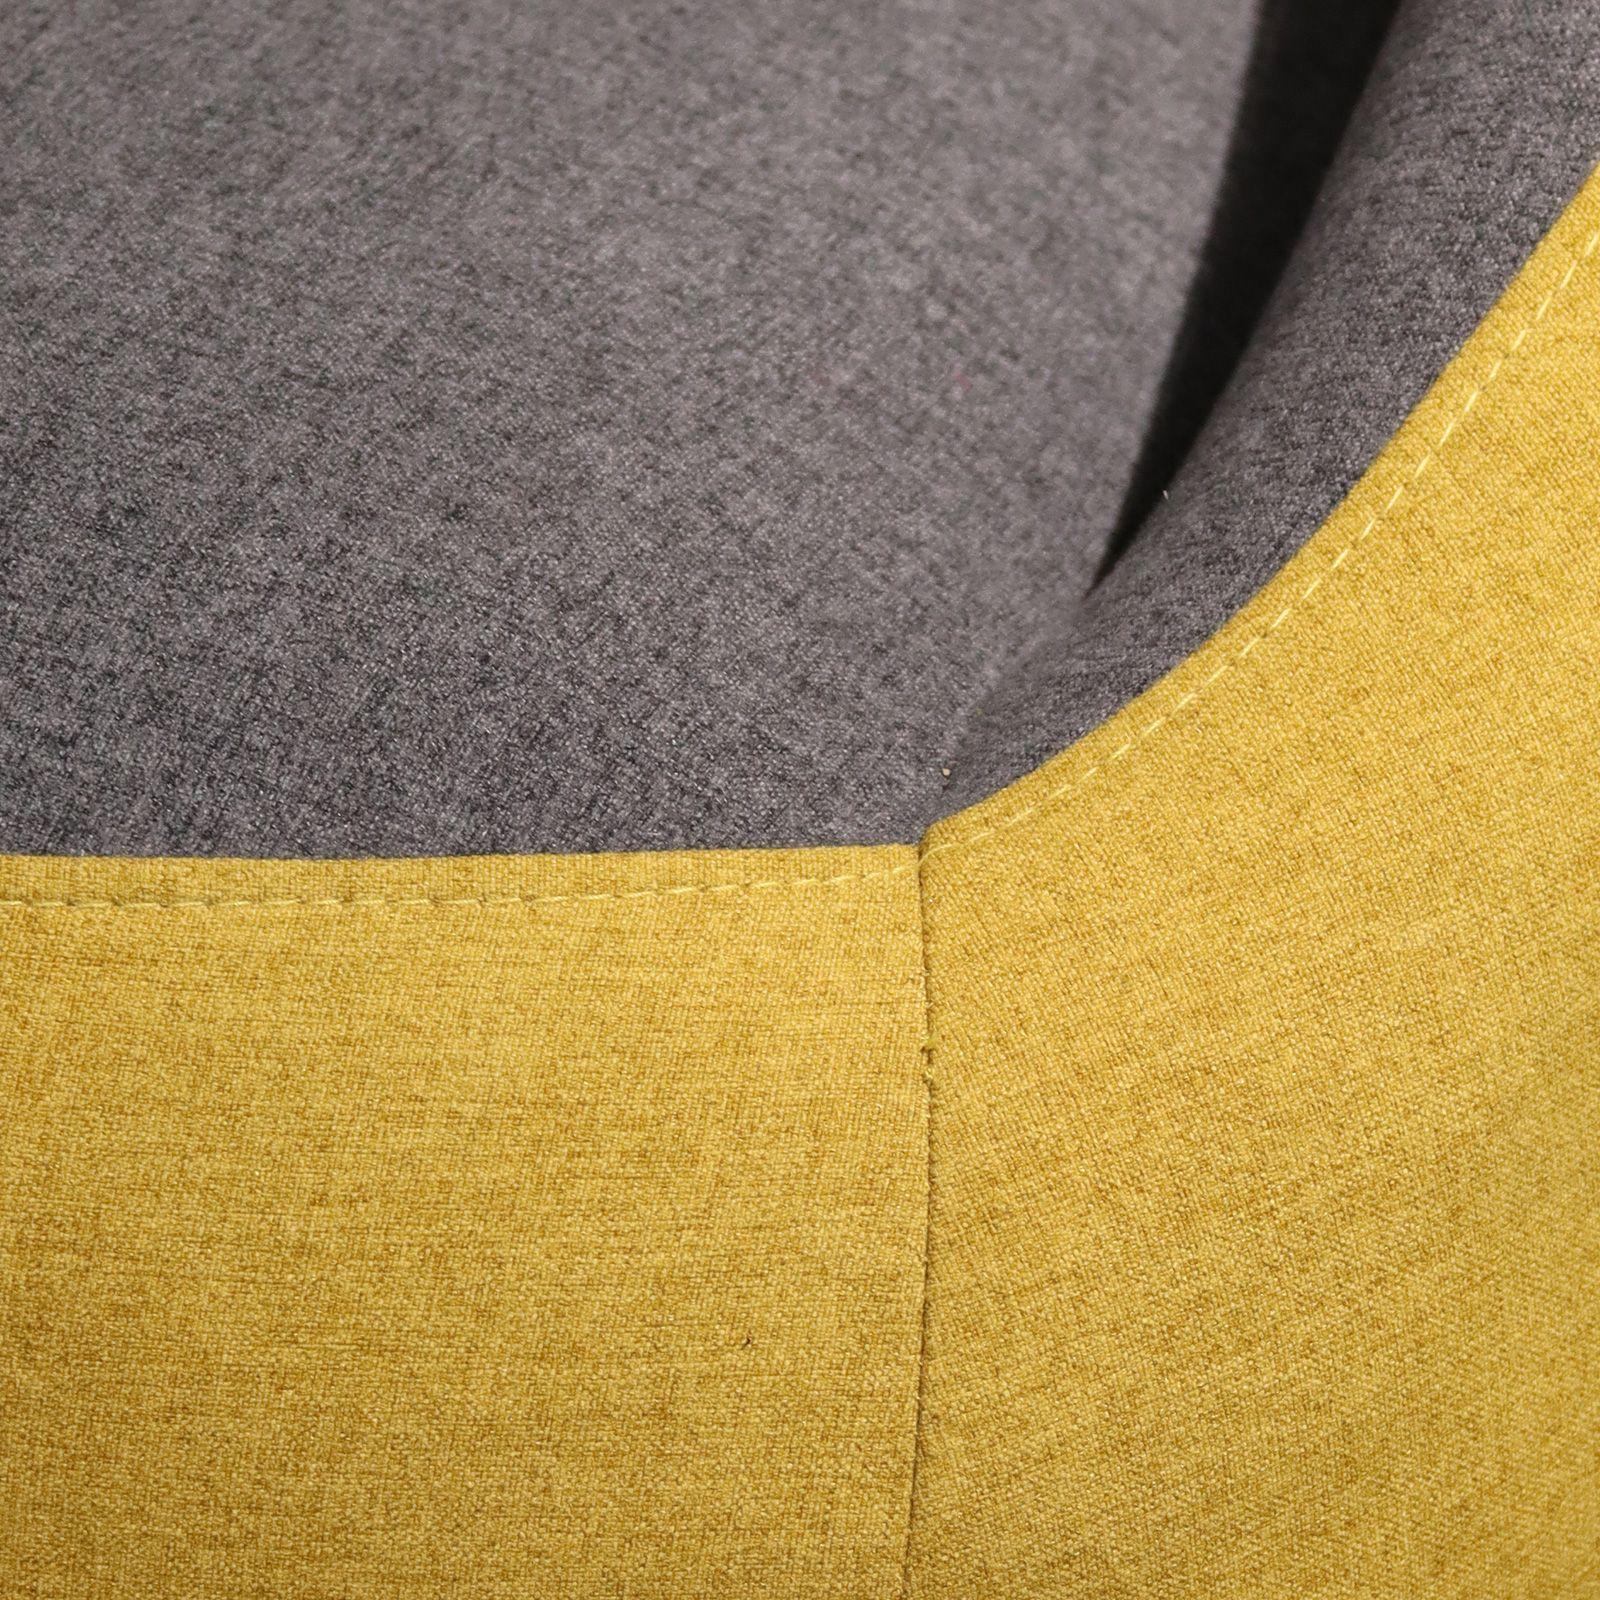 MARPE | Sofá con brazos tapizado bicolor mostaza/gris (142,5 x 83,5 x 75,5 cm)